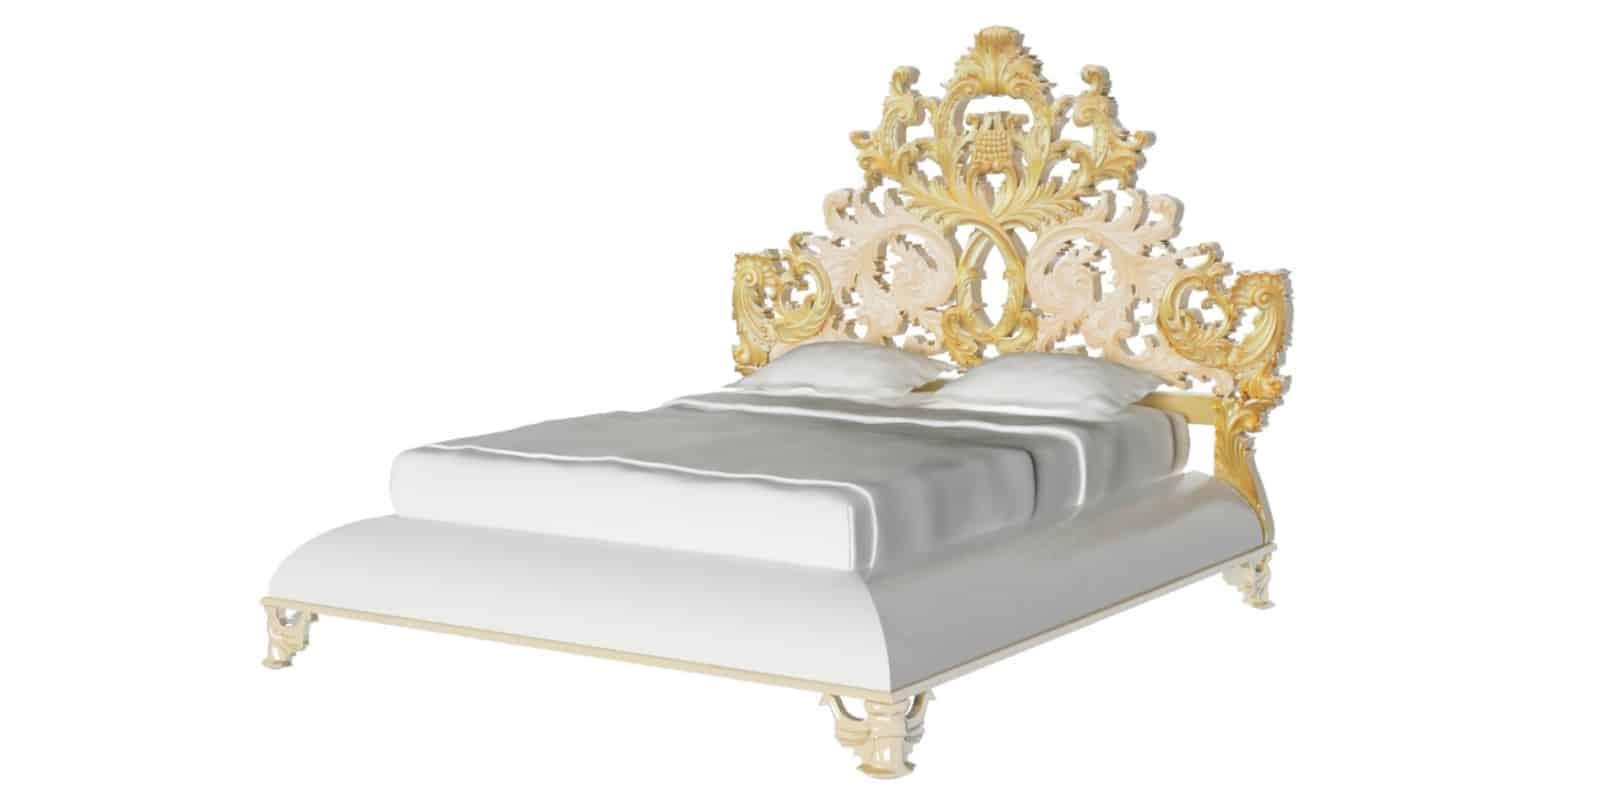 JETCLASS Unique Furniture Designs